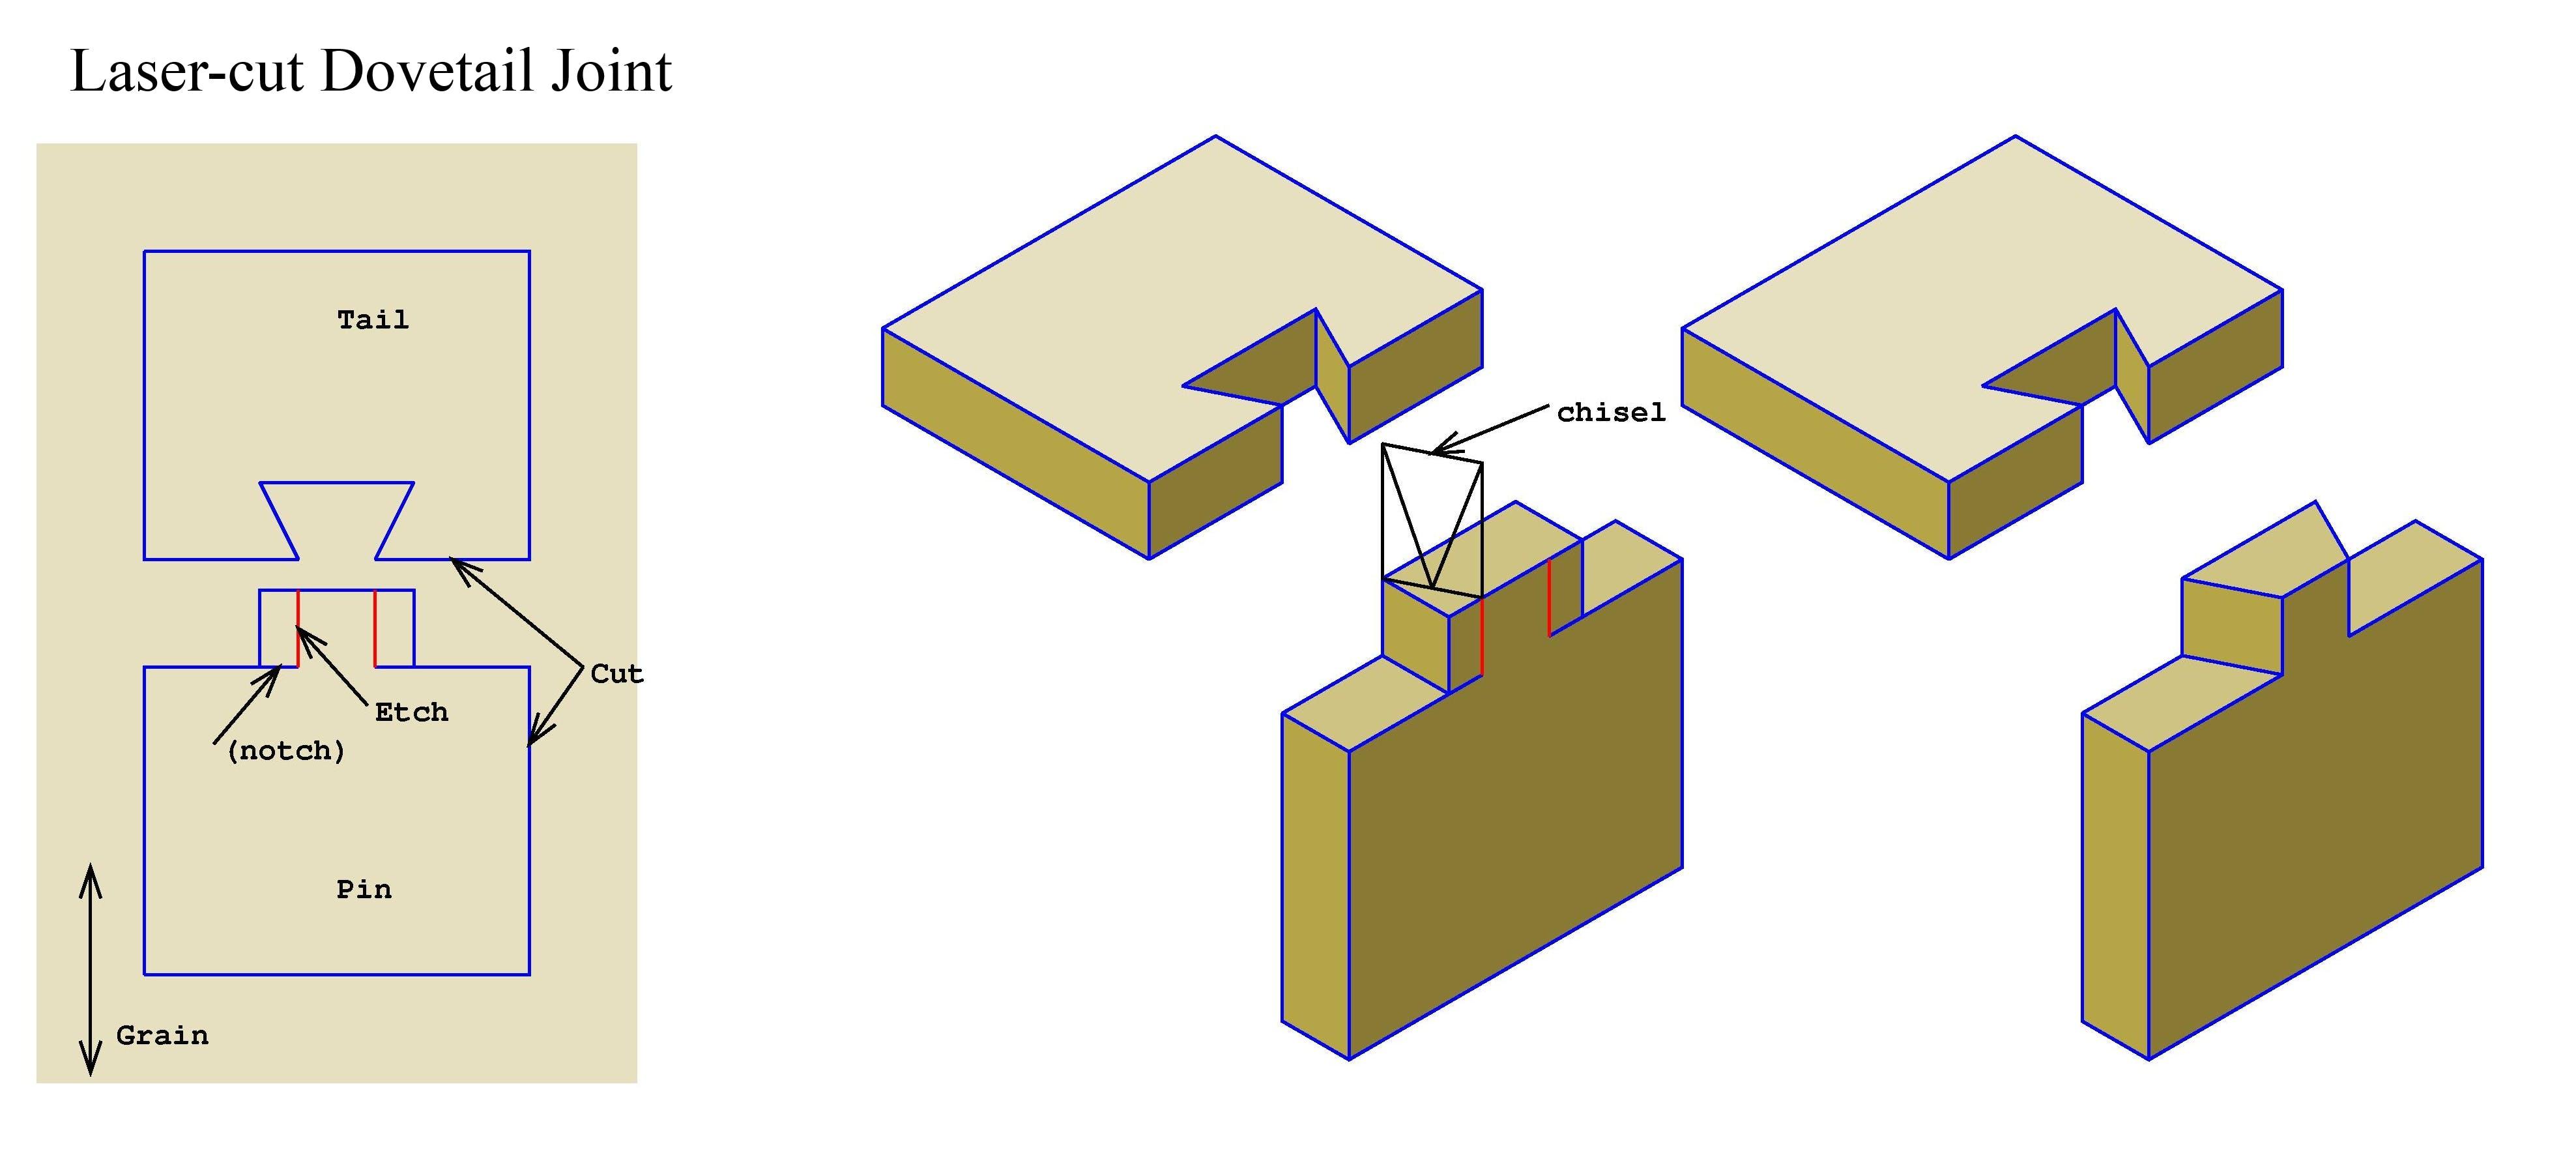 Laser-cut dovetails